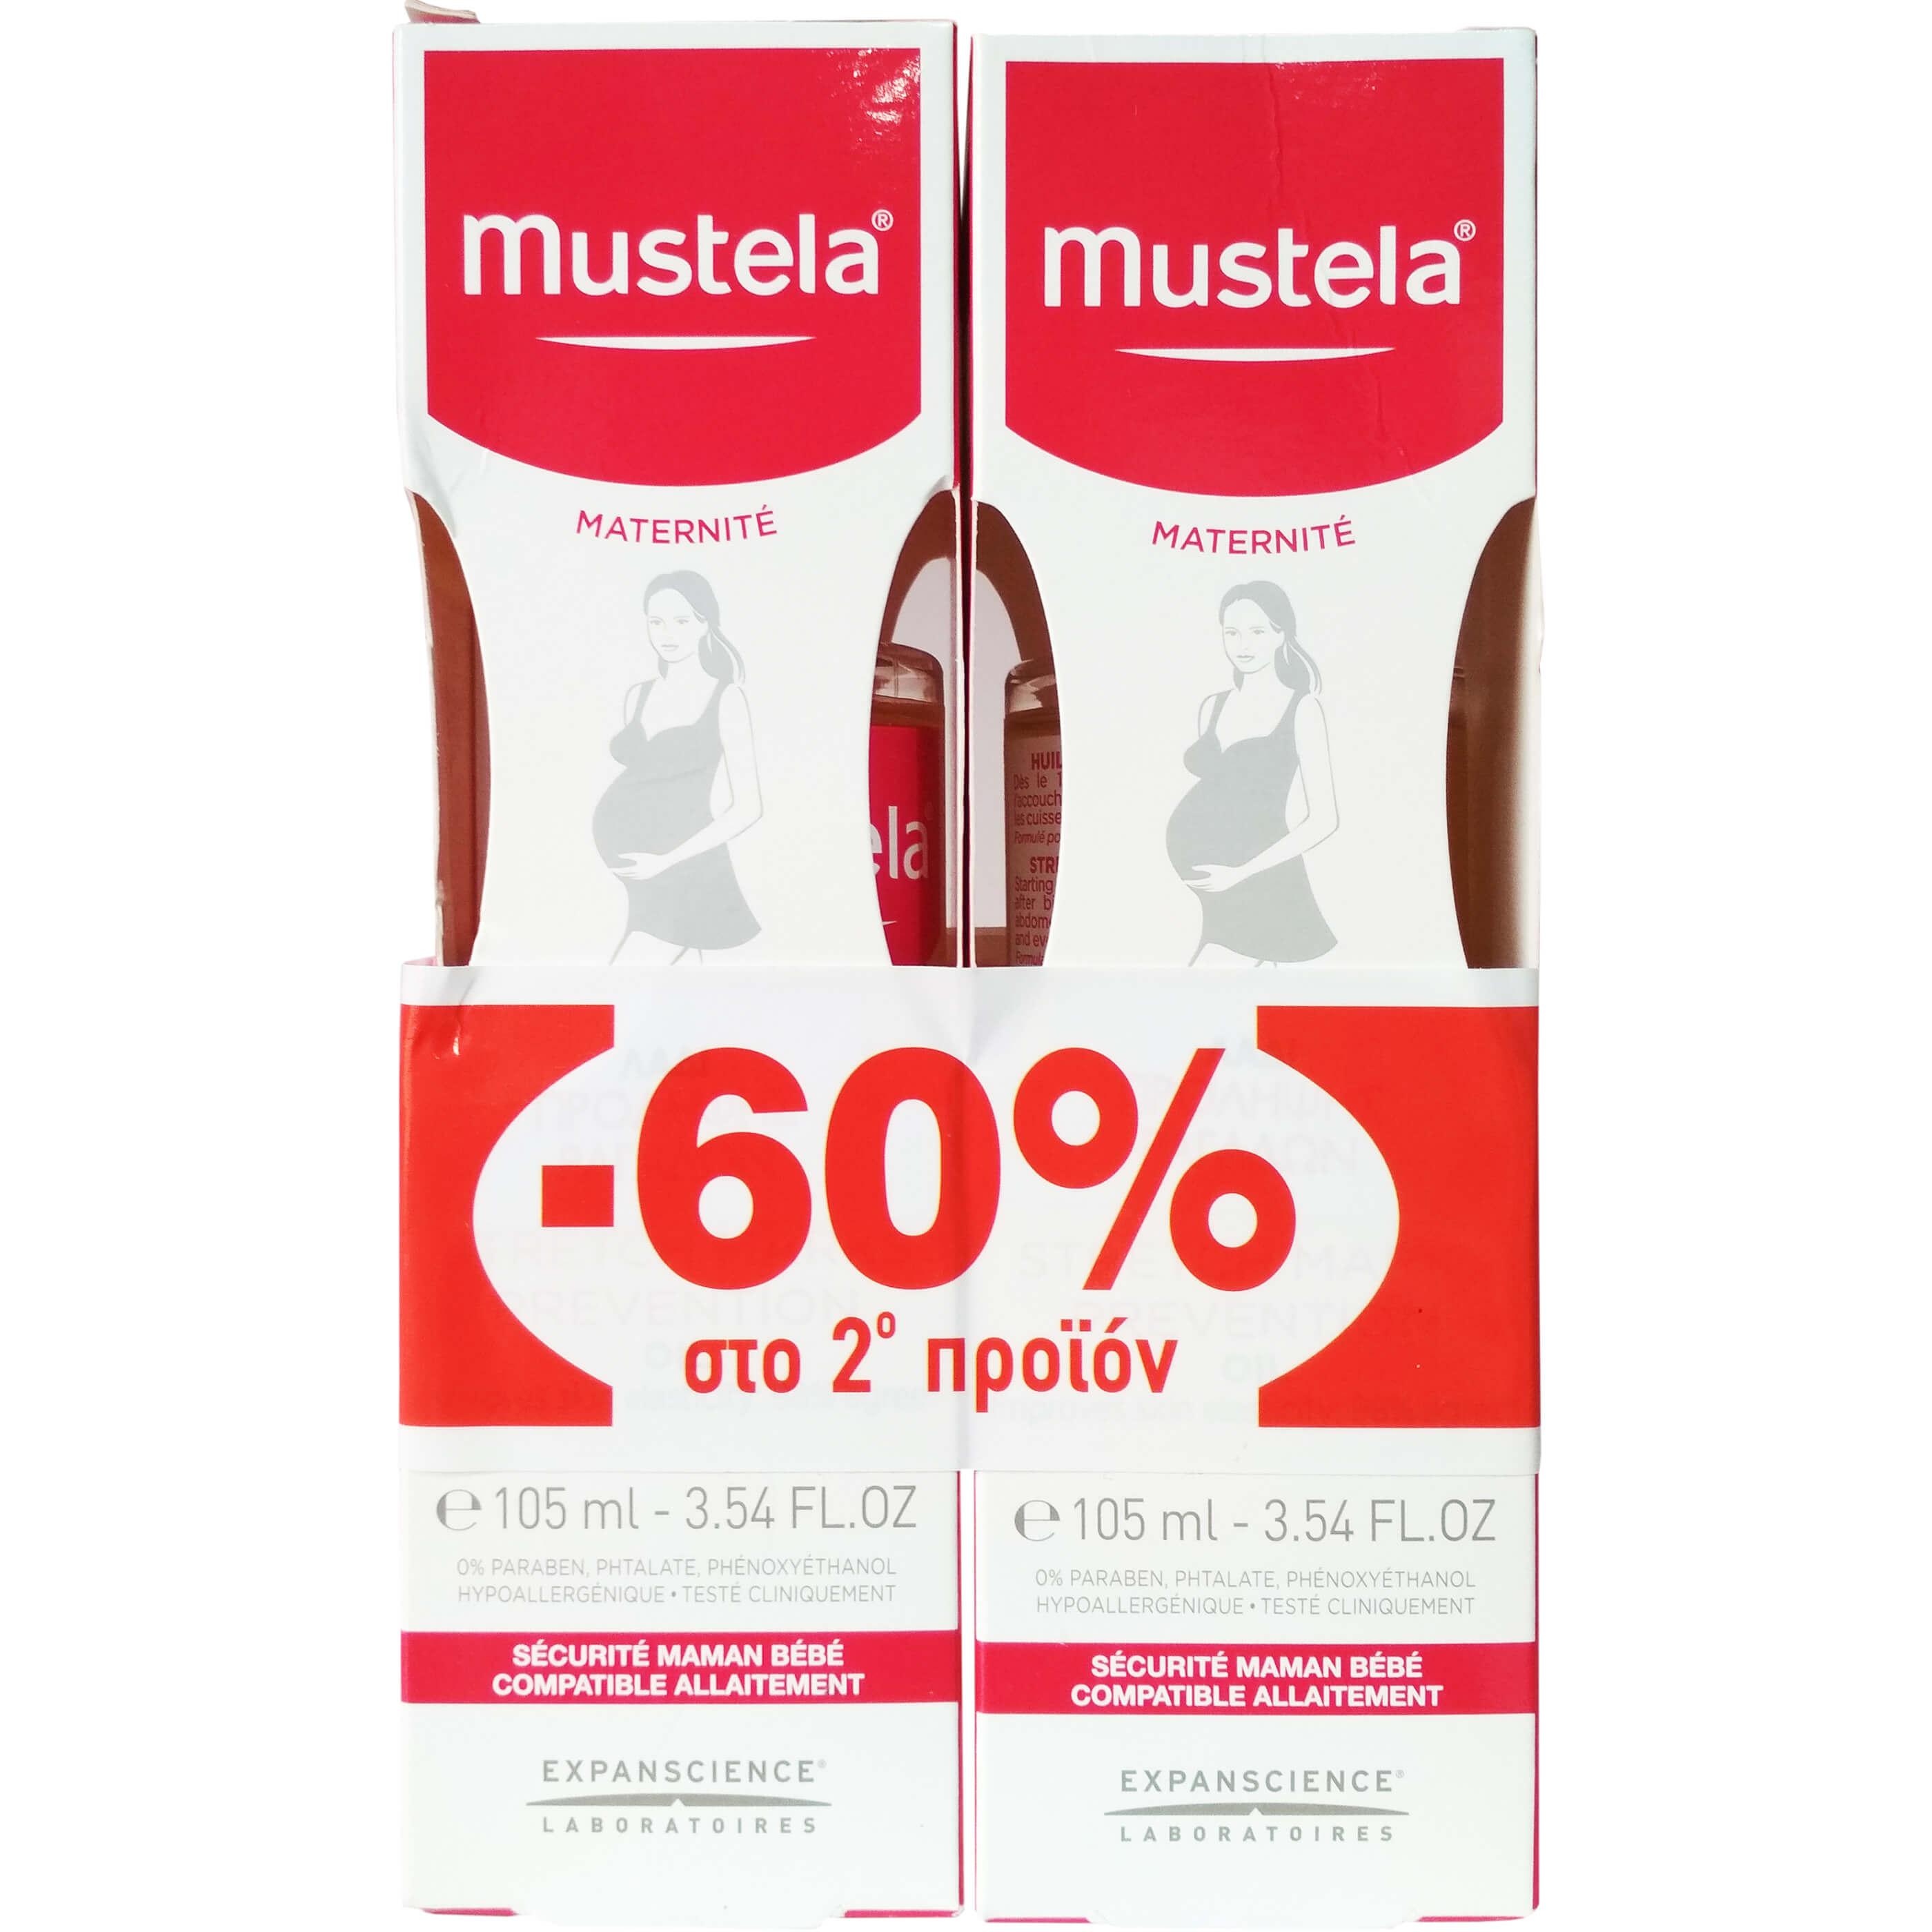 Mustela Πακέτο Προσφοράς Stretch Mark Prevention Oil, Λάδι Πρόληψης Ραγάδων 2x105ml Promo -60 στο 2ο Προϊόν